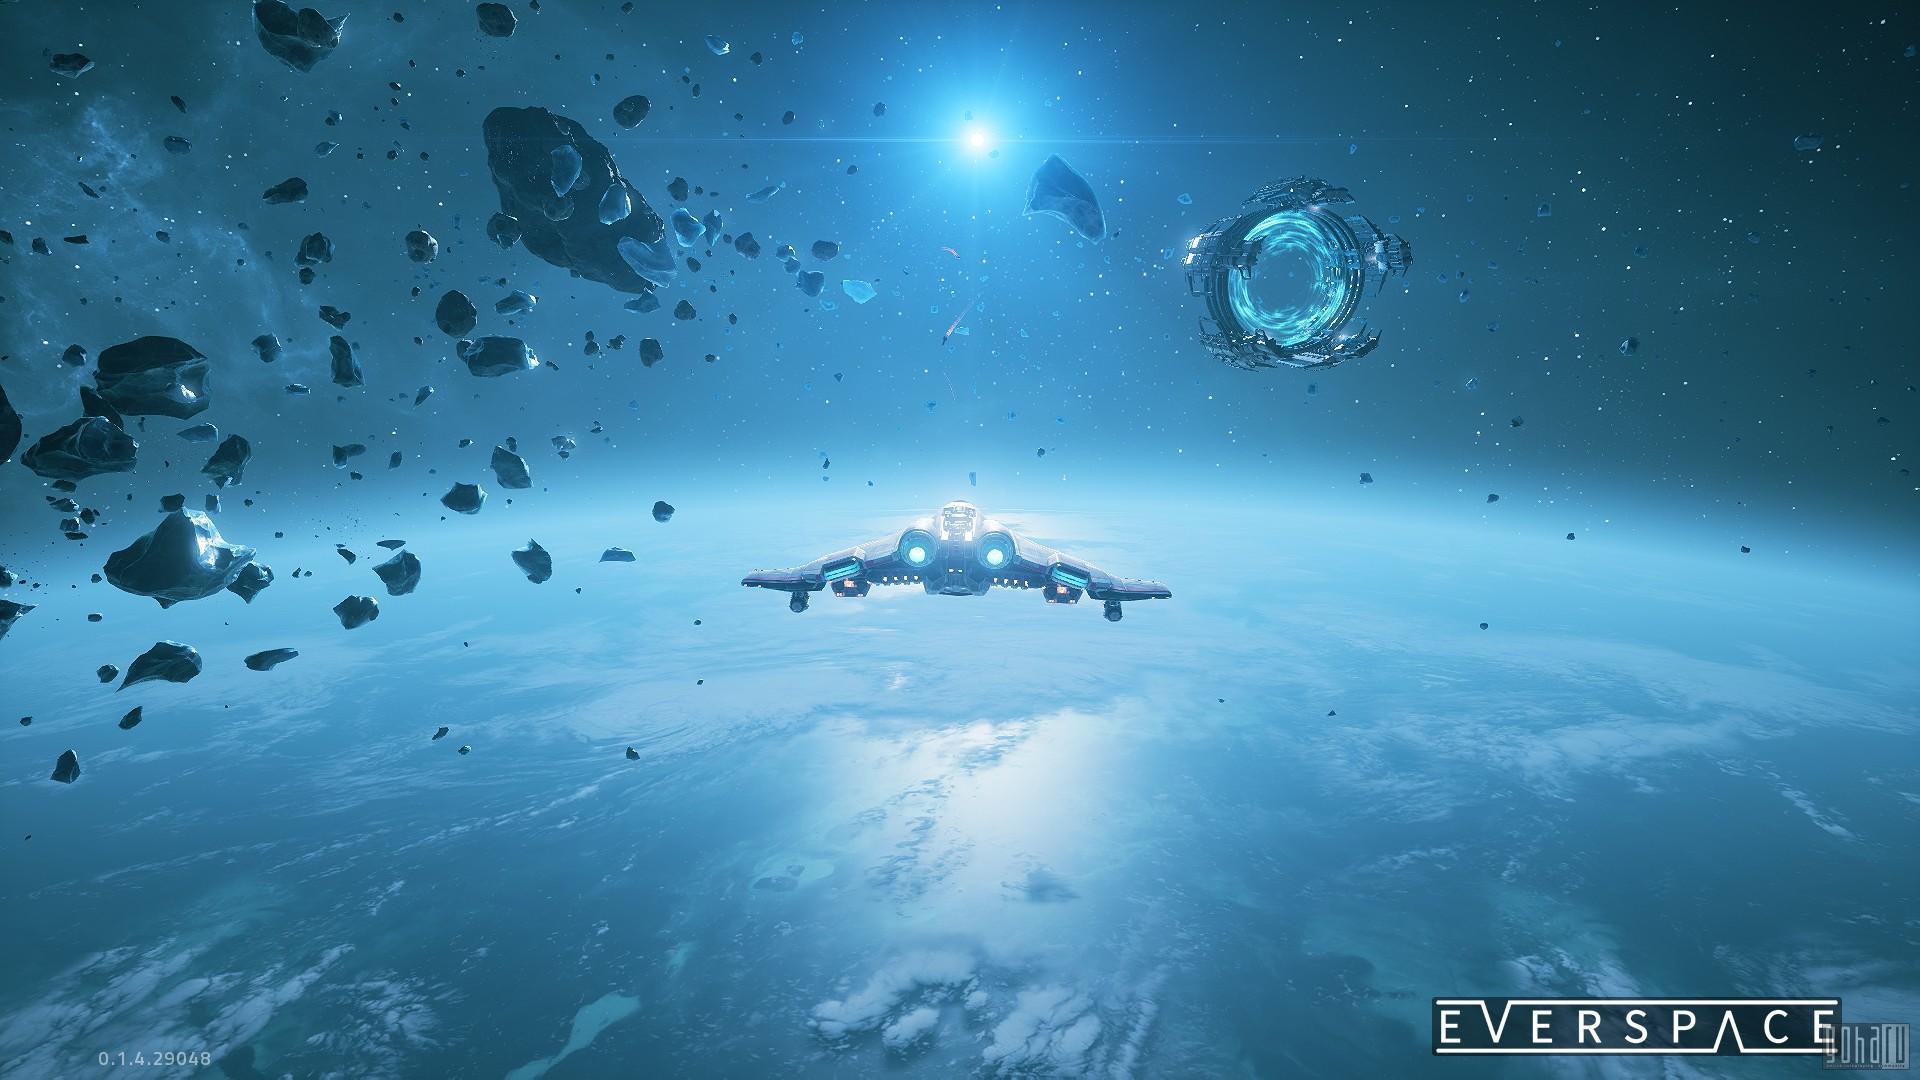 Everspace - занятный космический roguelike